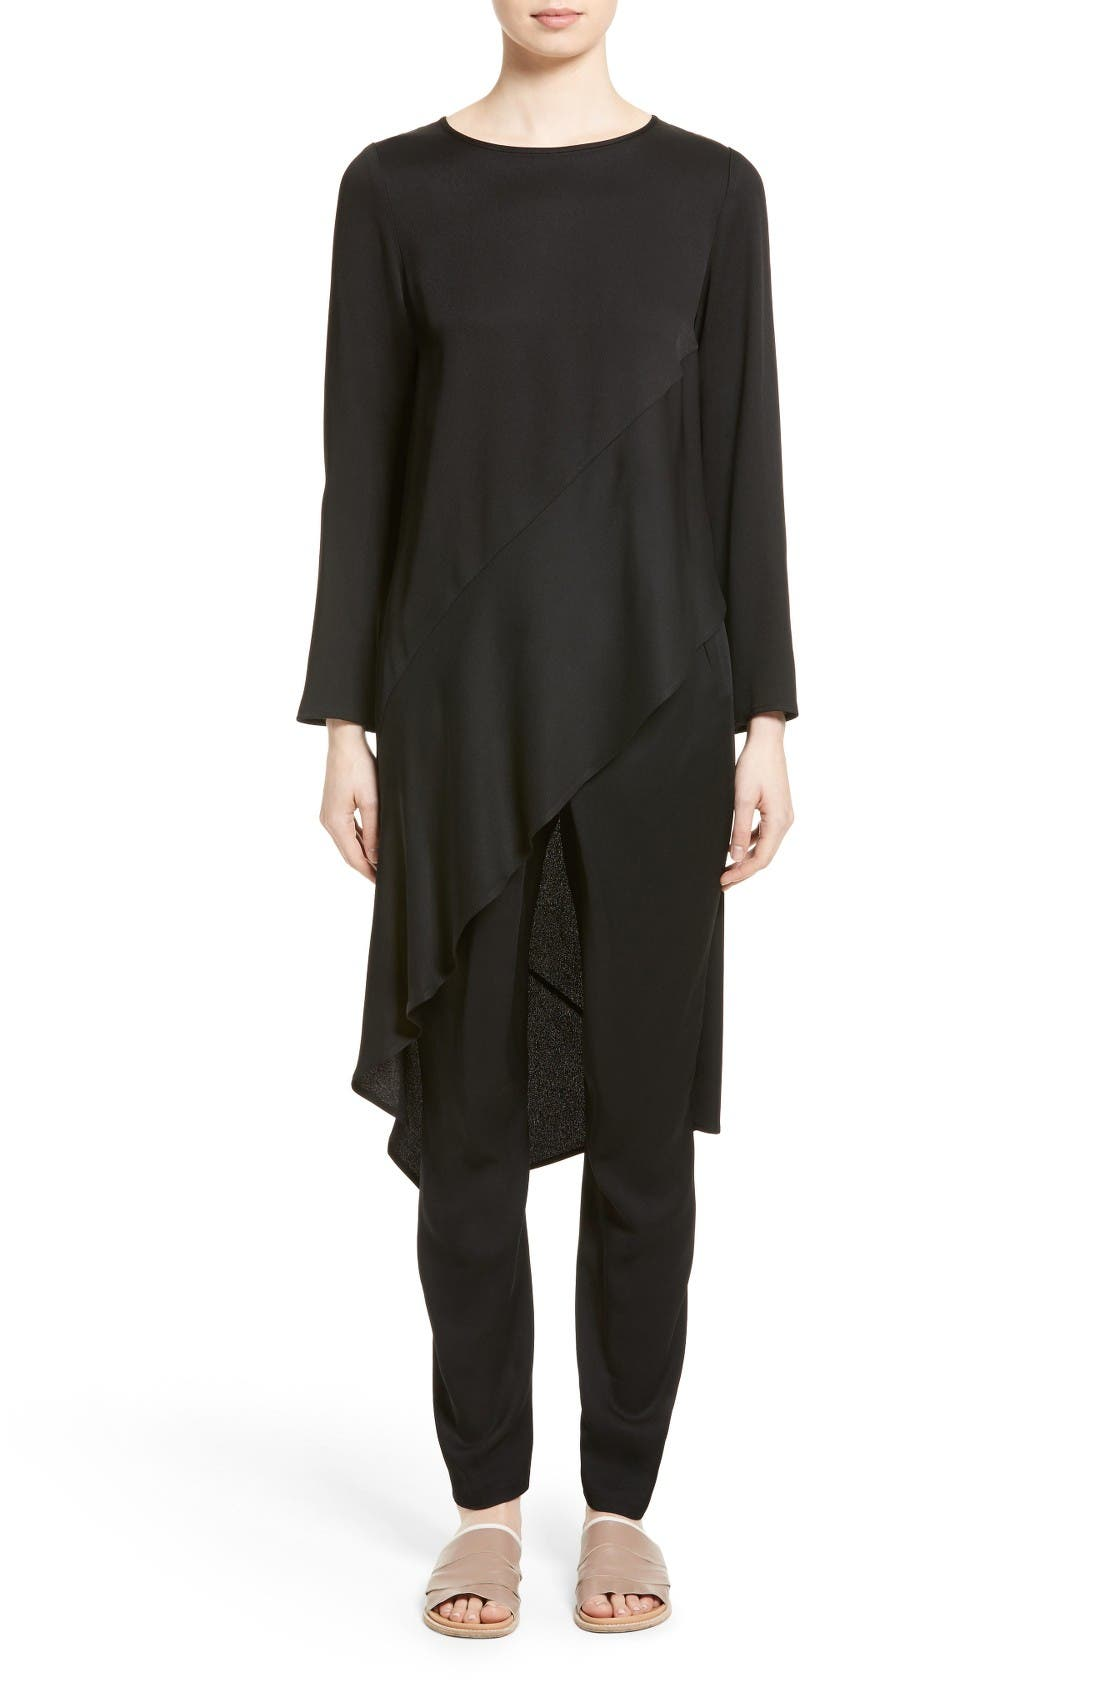 Alternate Image 1 Selected - Zero + Maria Cornejo Heli Asymmetrical Tunic